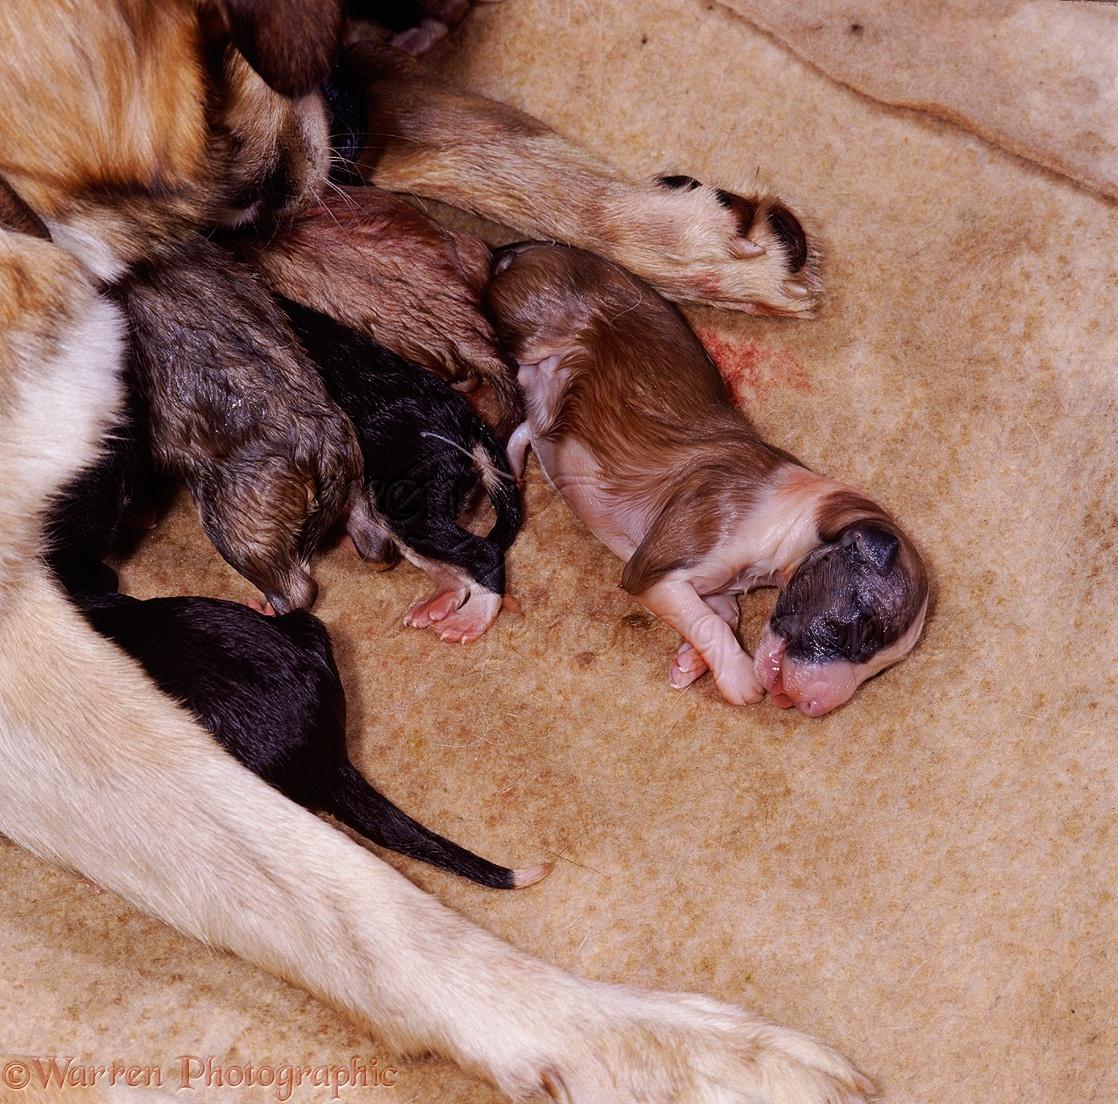 Dogs Newborn Border Collie Puppy Photo Wp04812